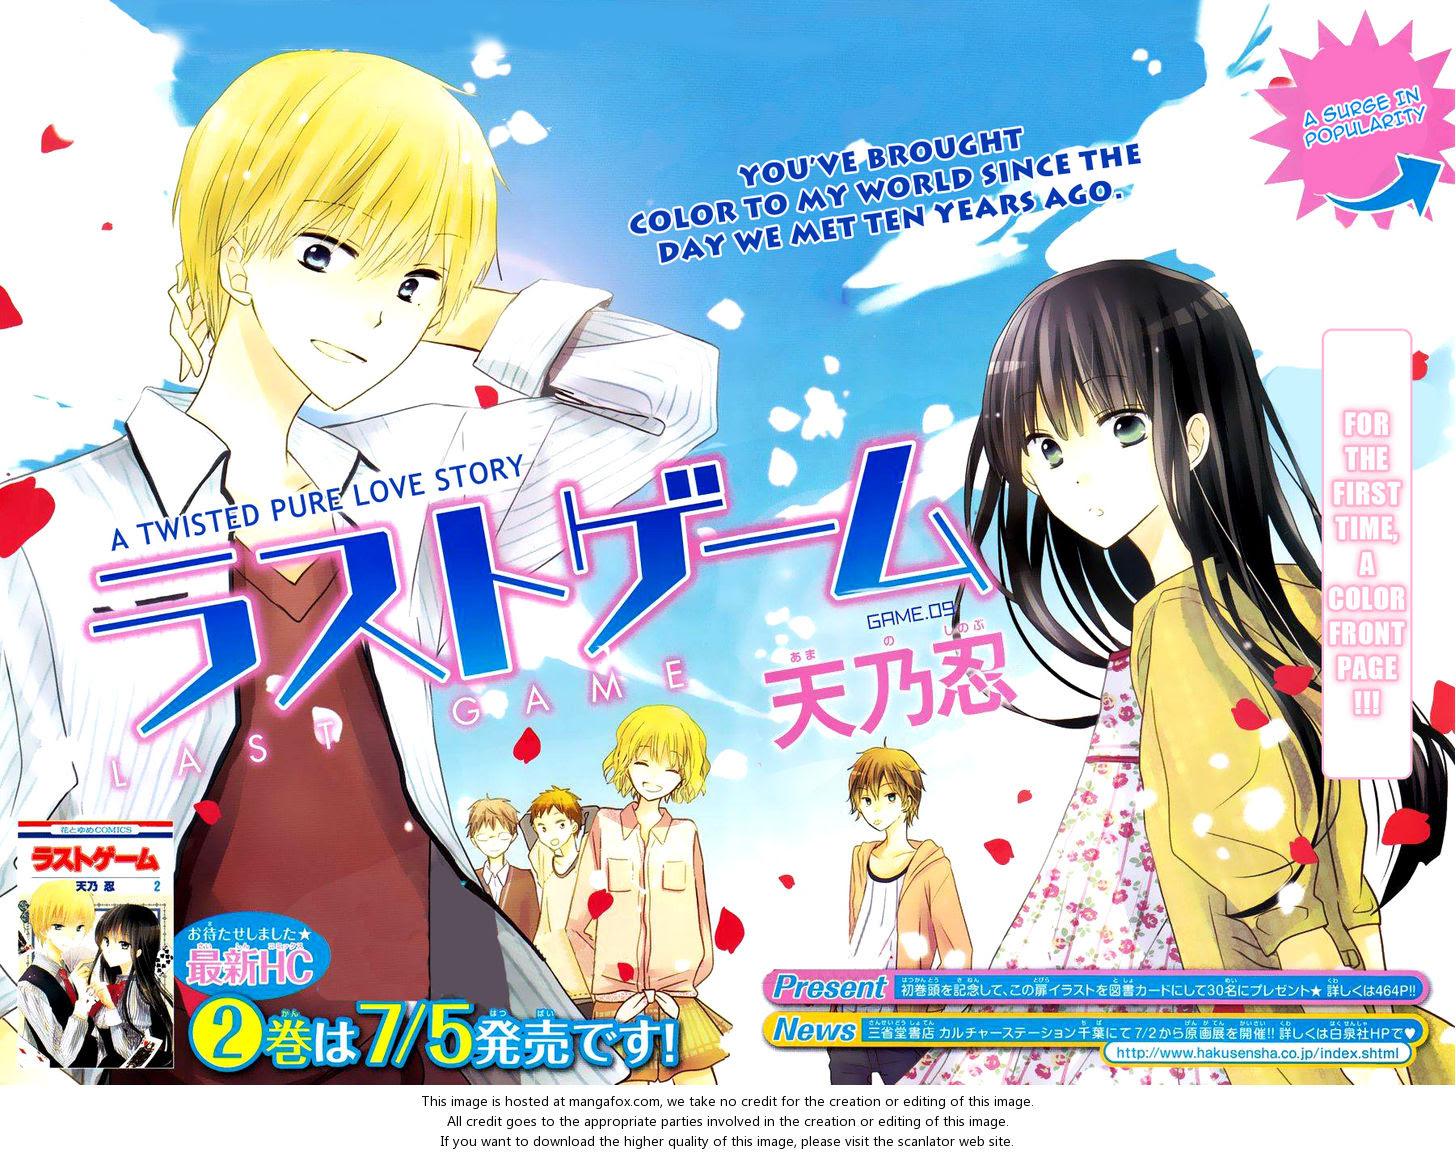 Last Game Manga Wallpaper 39472460 Fanpop